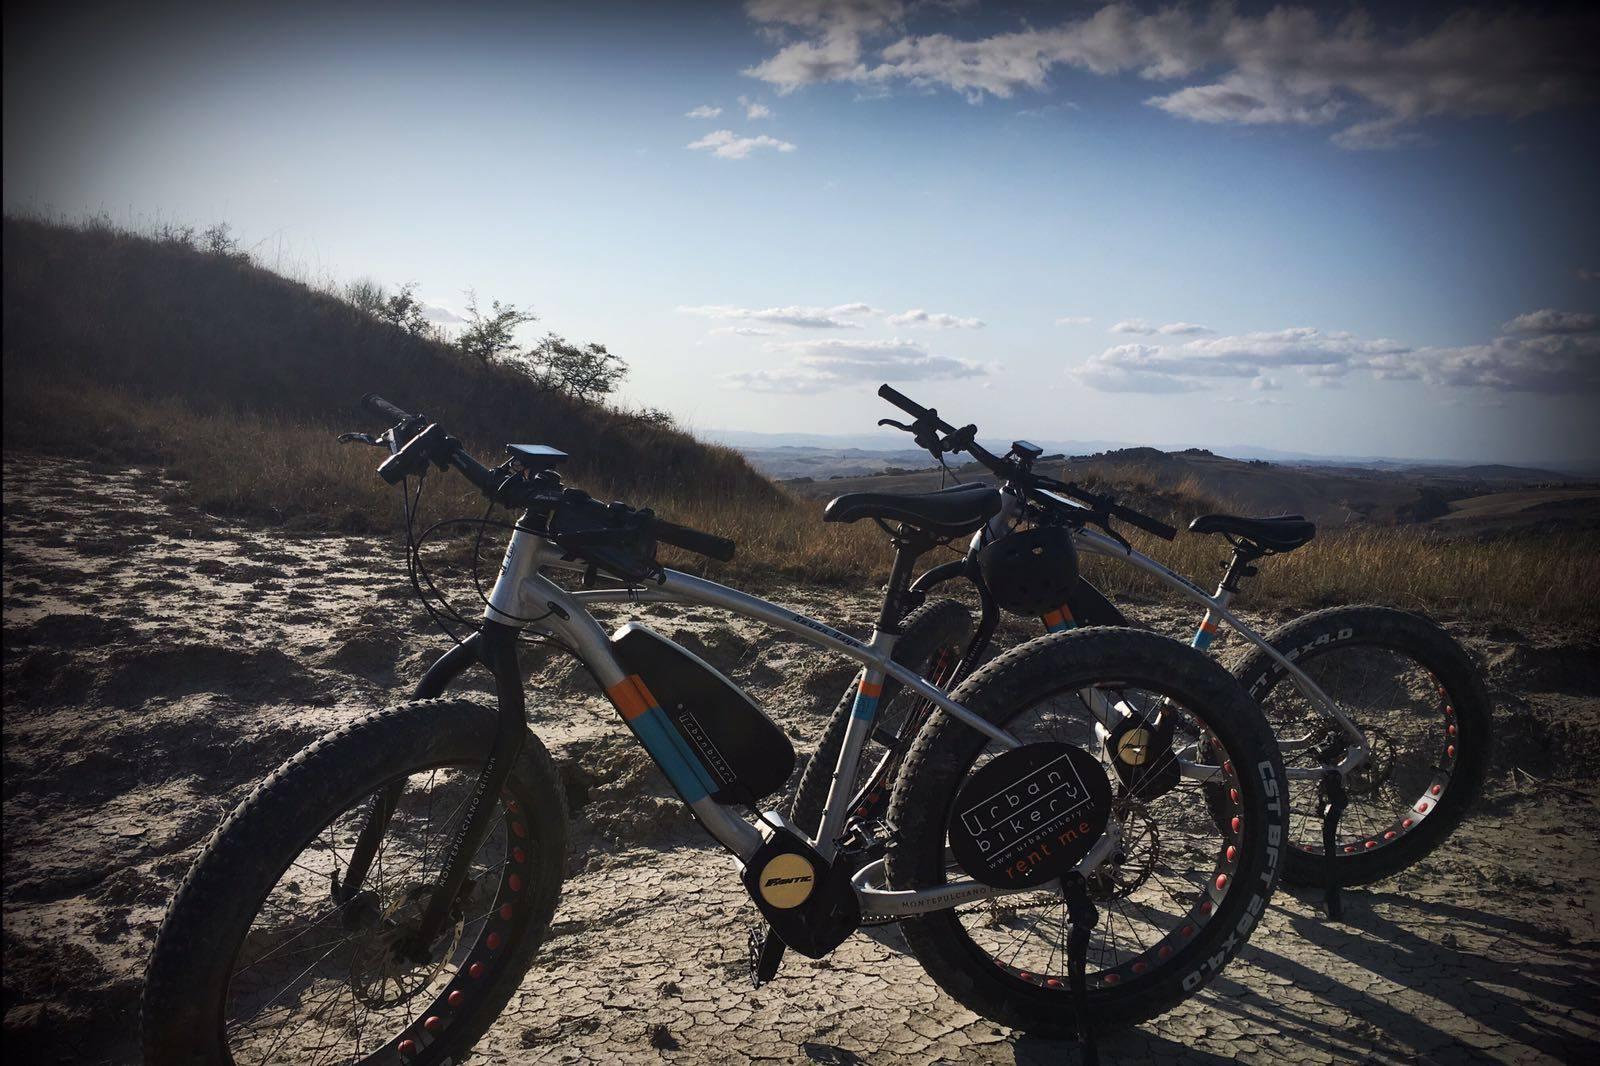 visit montepulciano e-bike urban bikery